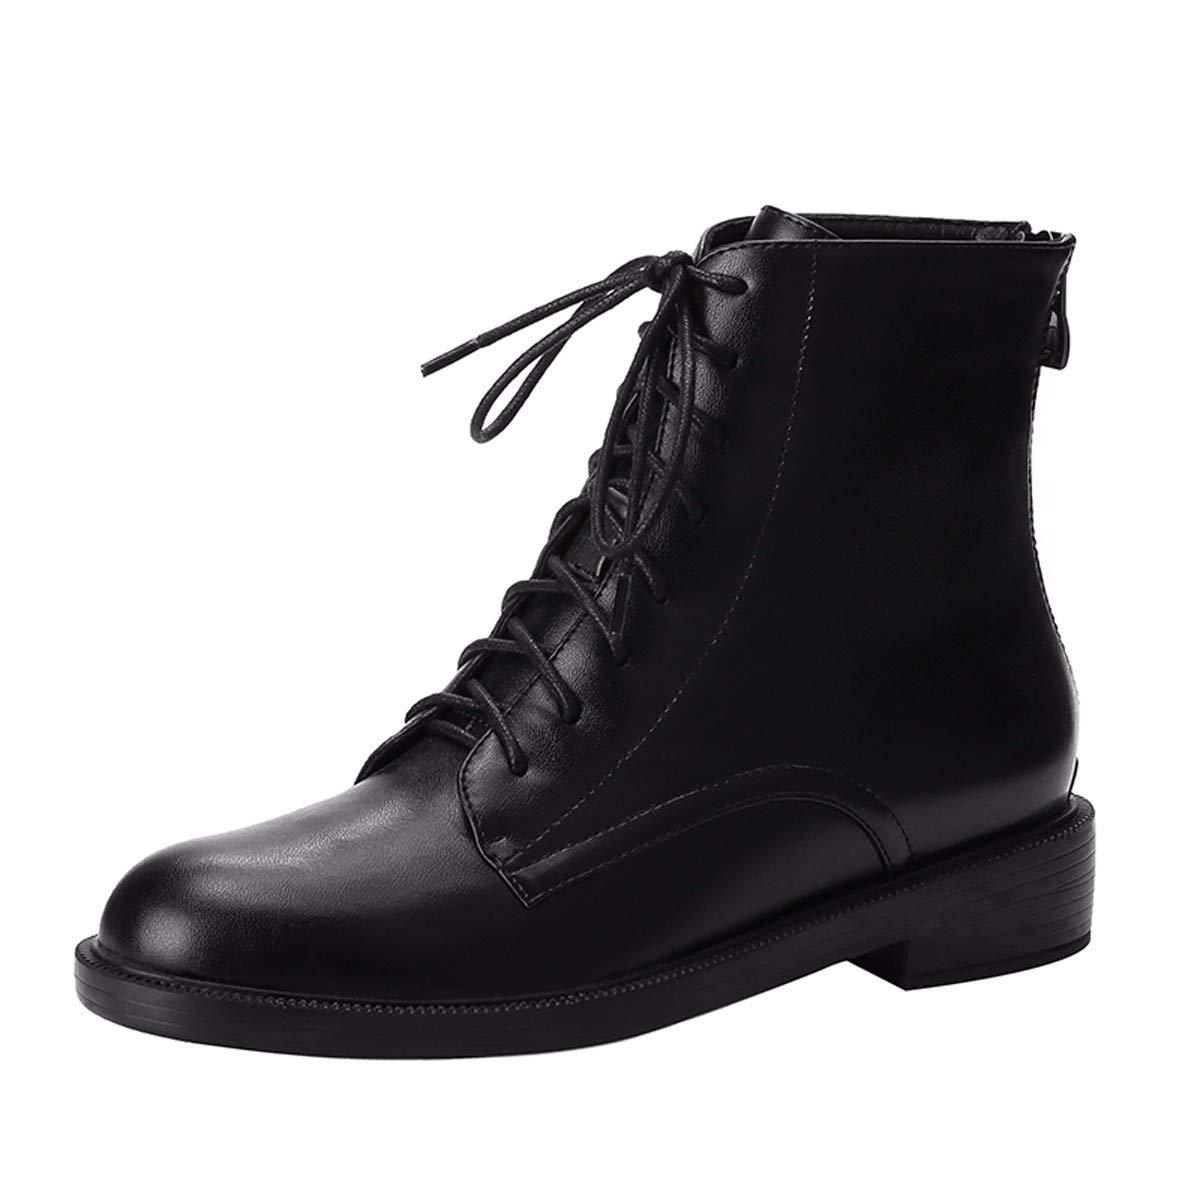 KOKQSX-Damen - Stiefel echtes Leder Runden Kopf Krawatte Mode Schuhe Martin Stiefel.